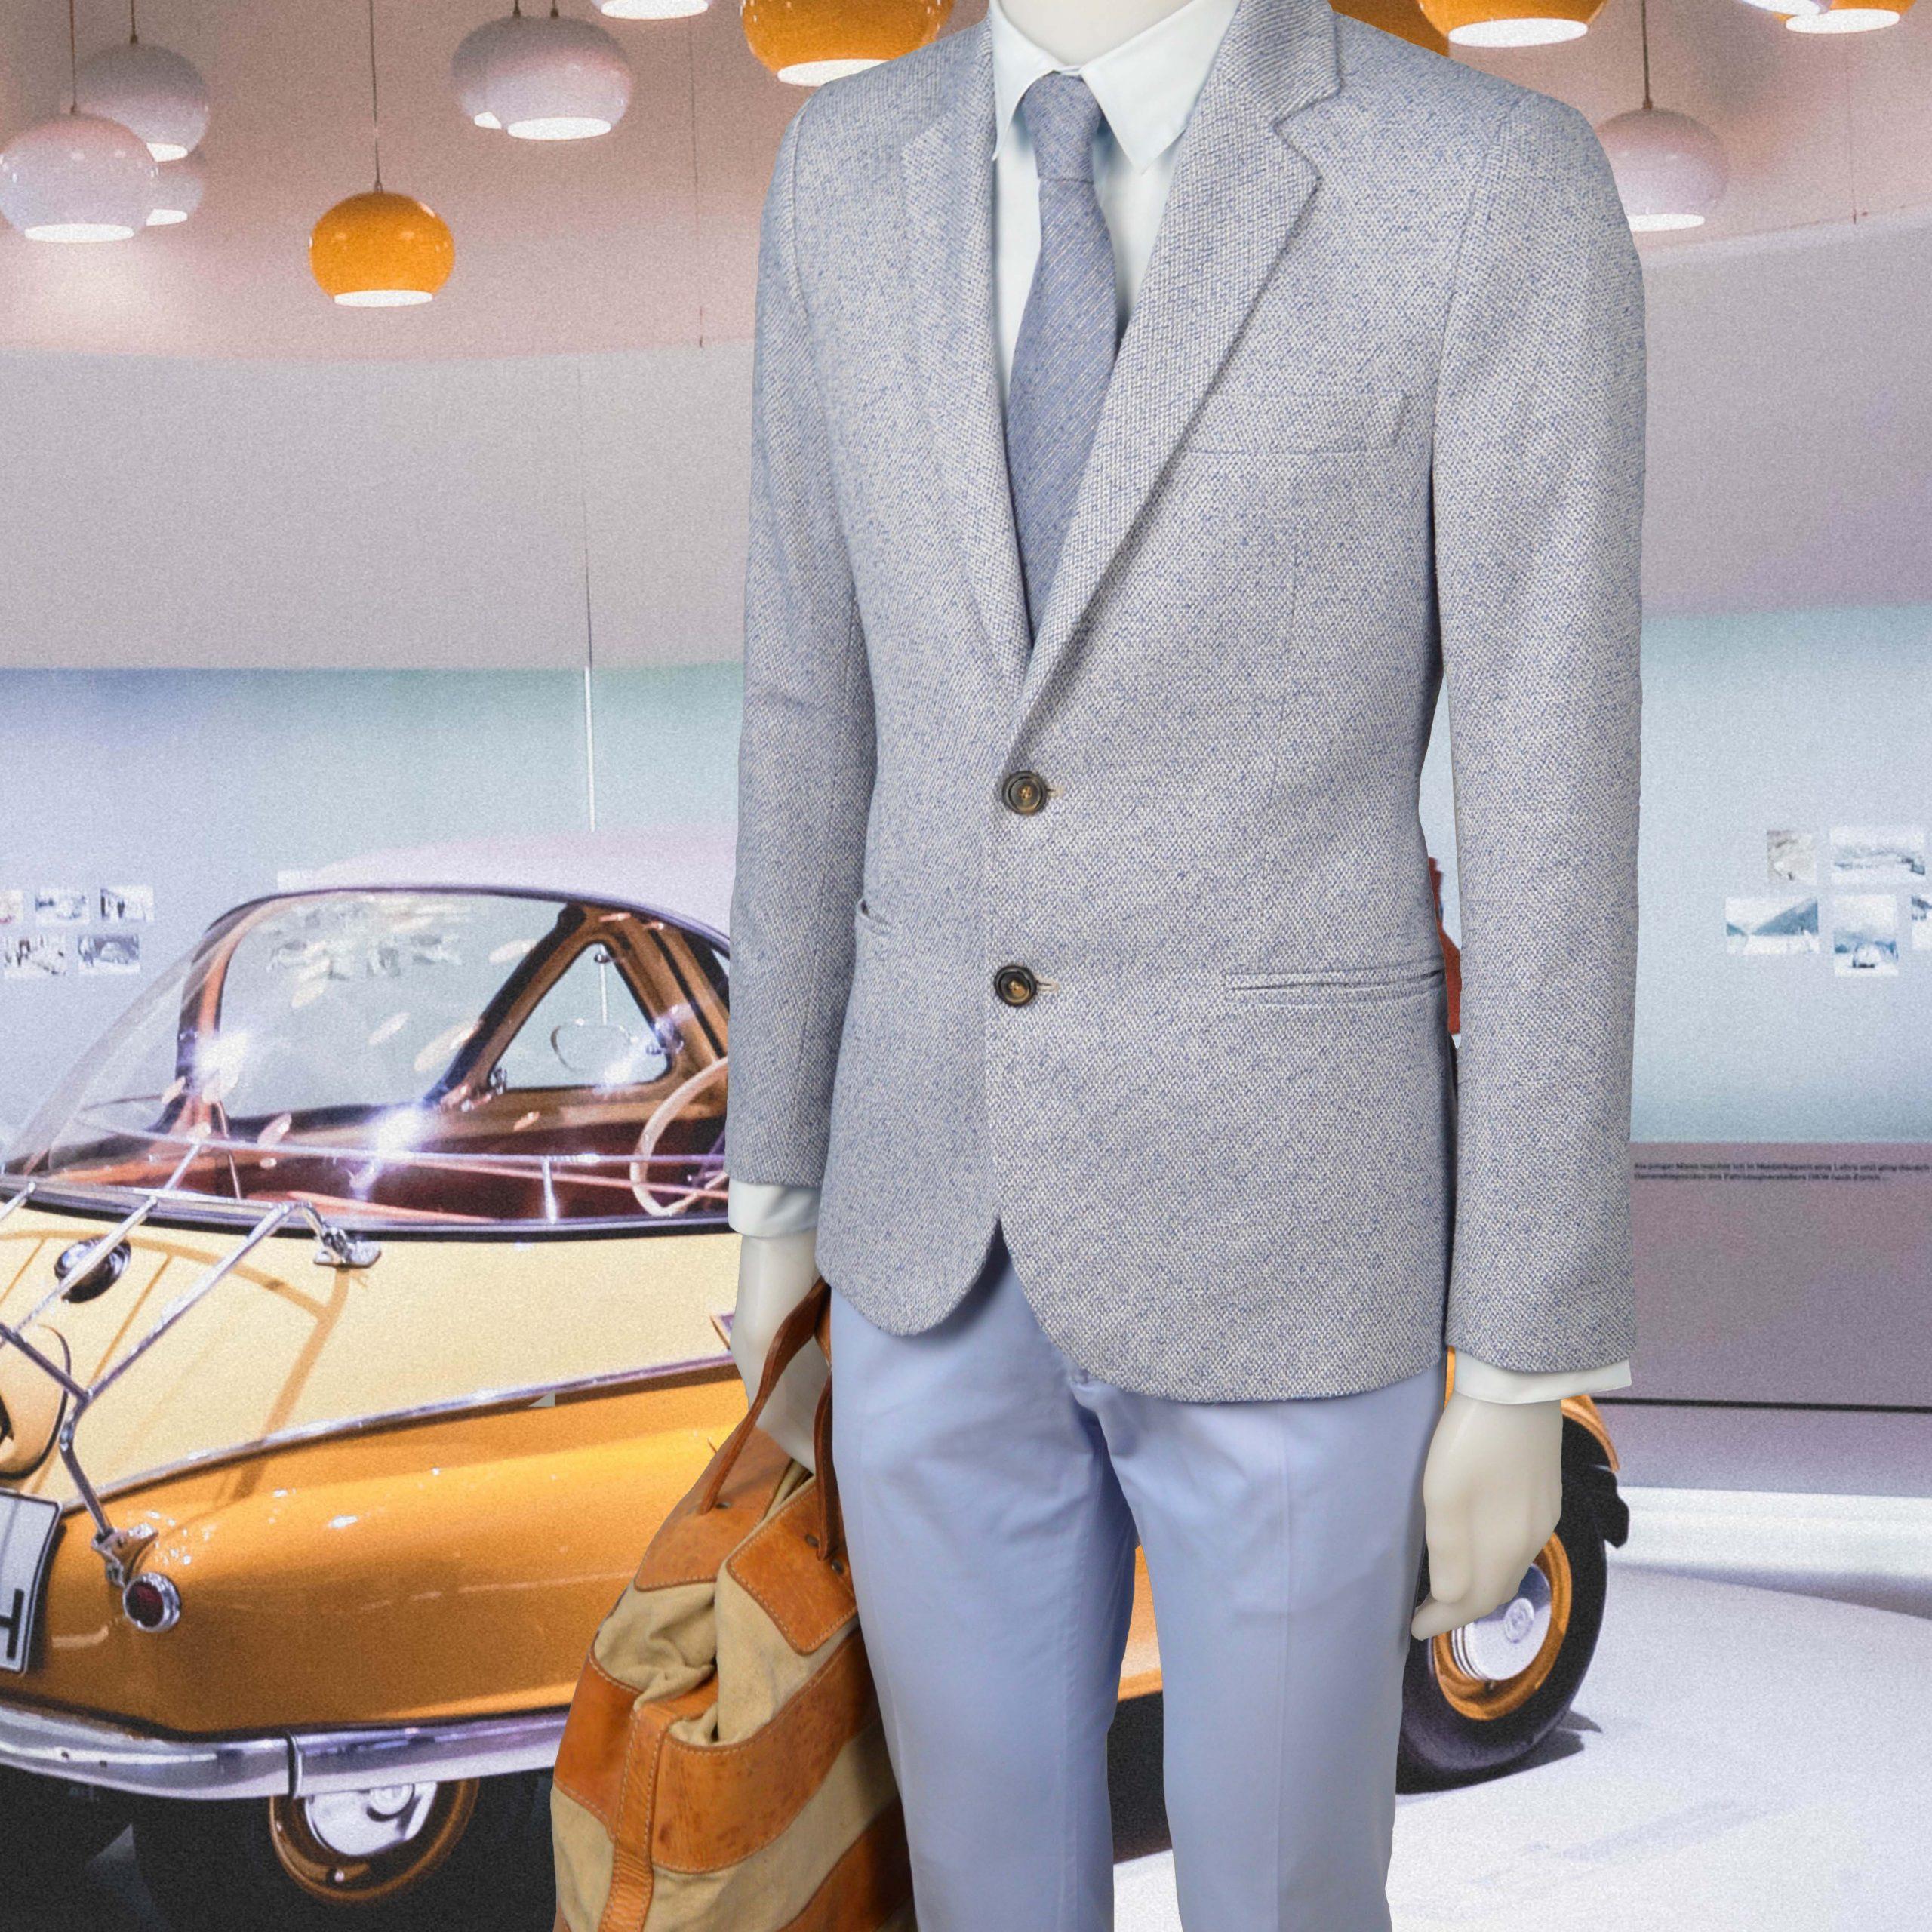 kresse-oliver-sommersakko-streetstyle-mens_fashion-herrenmode